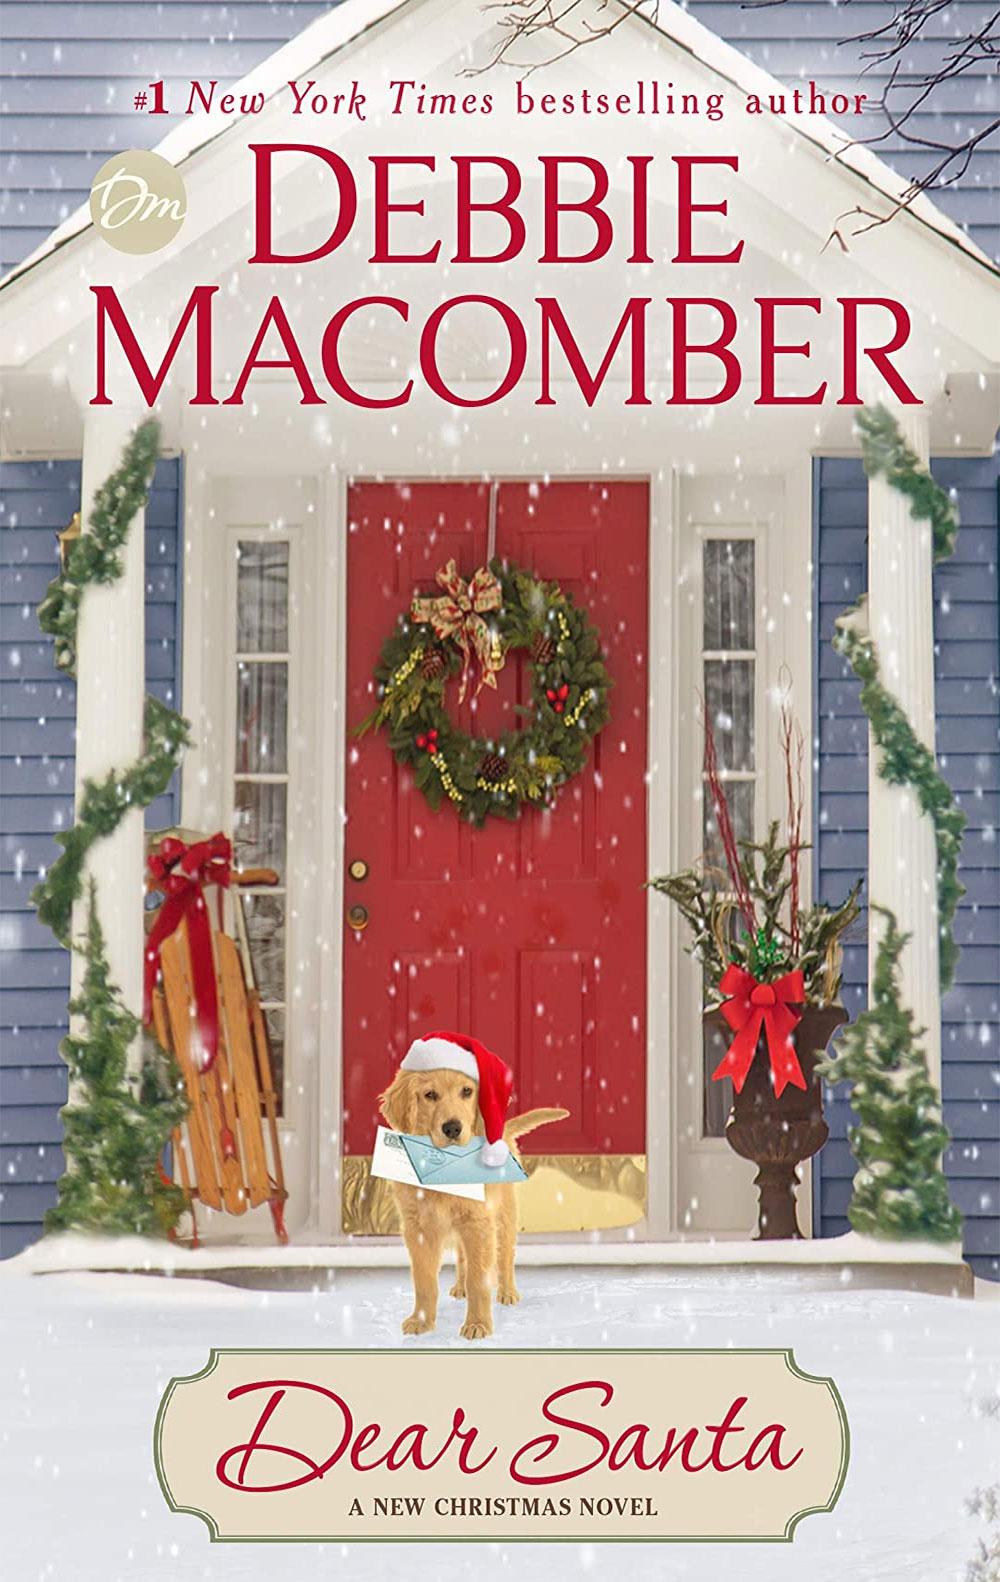 Dear Santa by Debbie Macomber